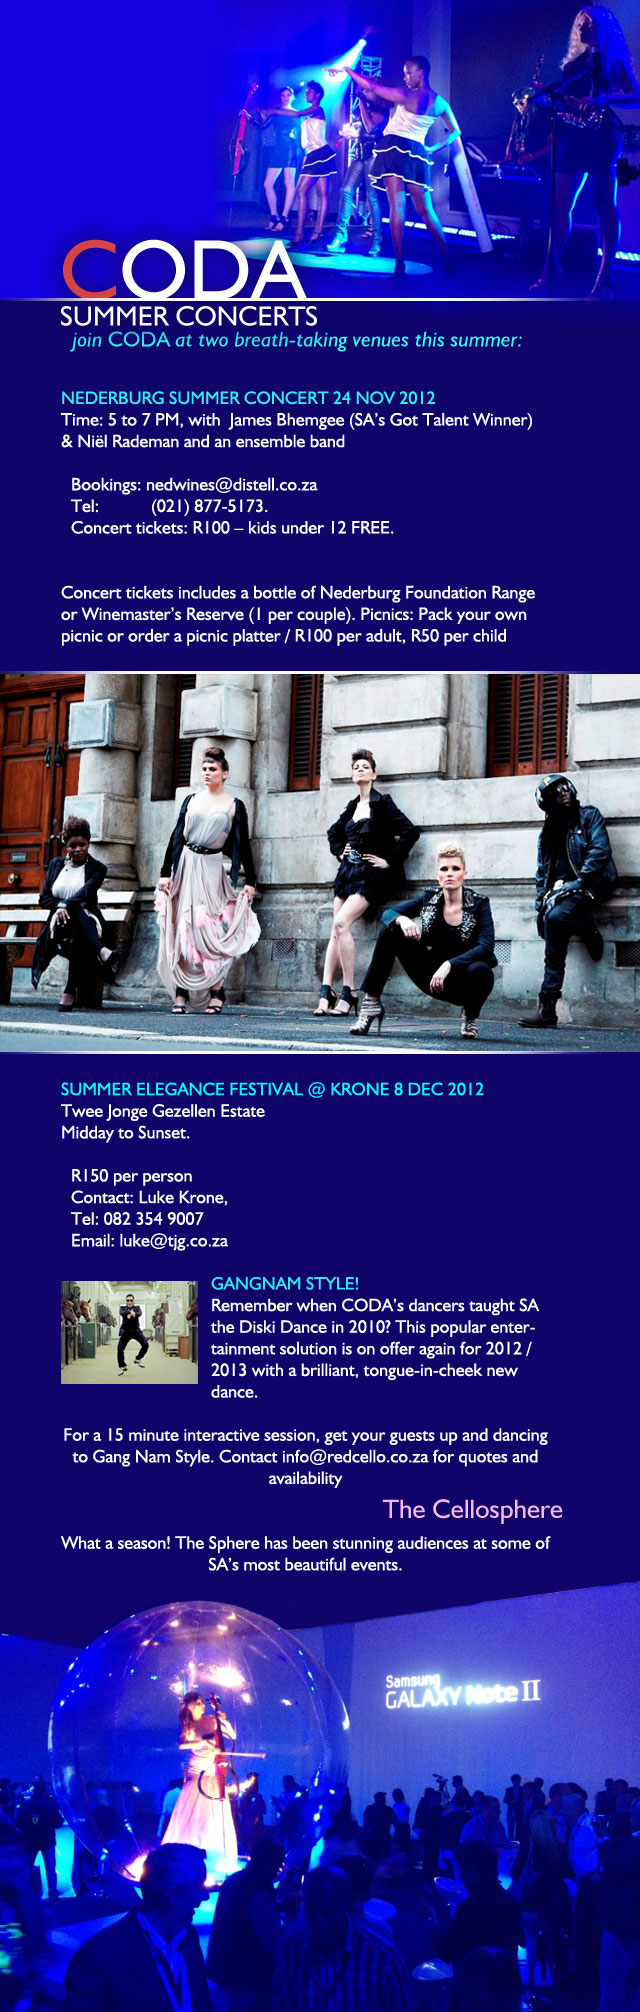 CODA Summer Concerts